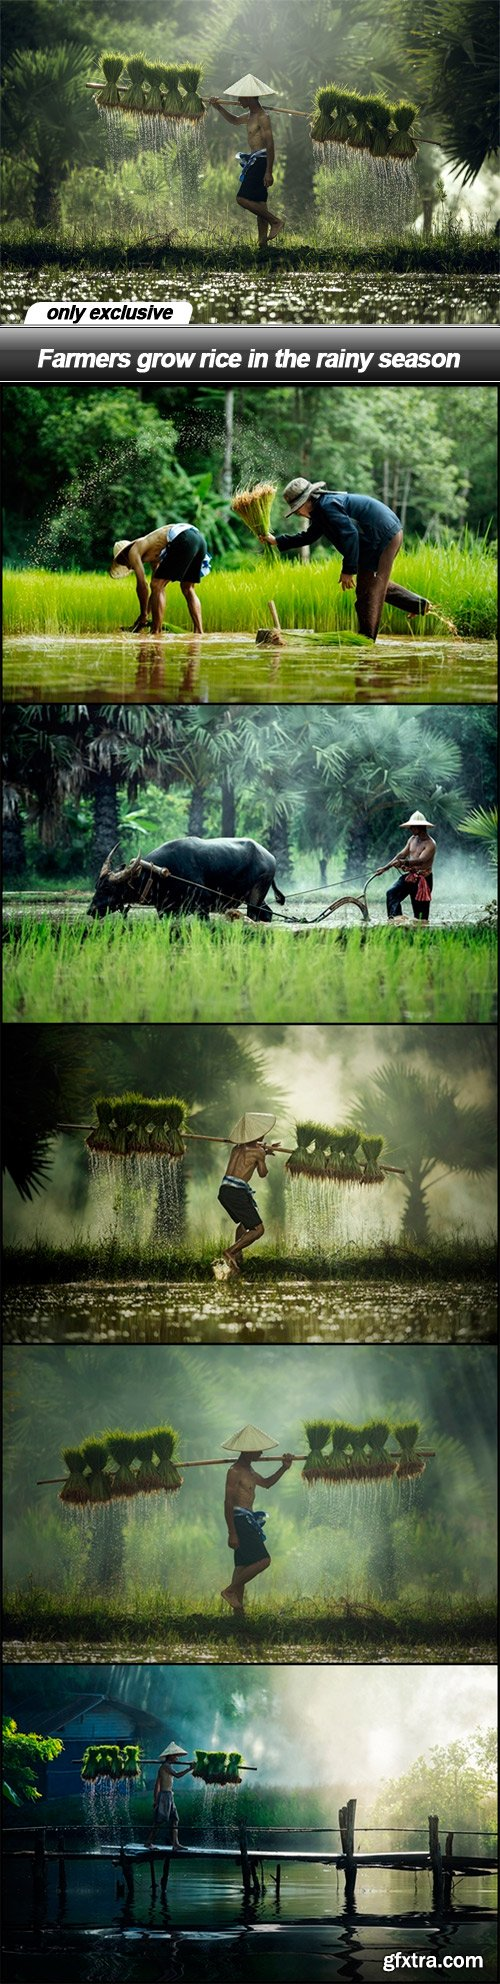 Farmers grow rice in the rainy season - 6 UHQ JPEG